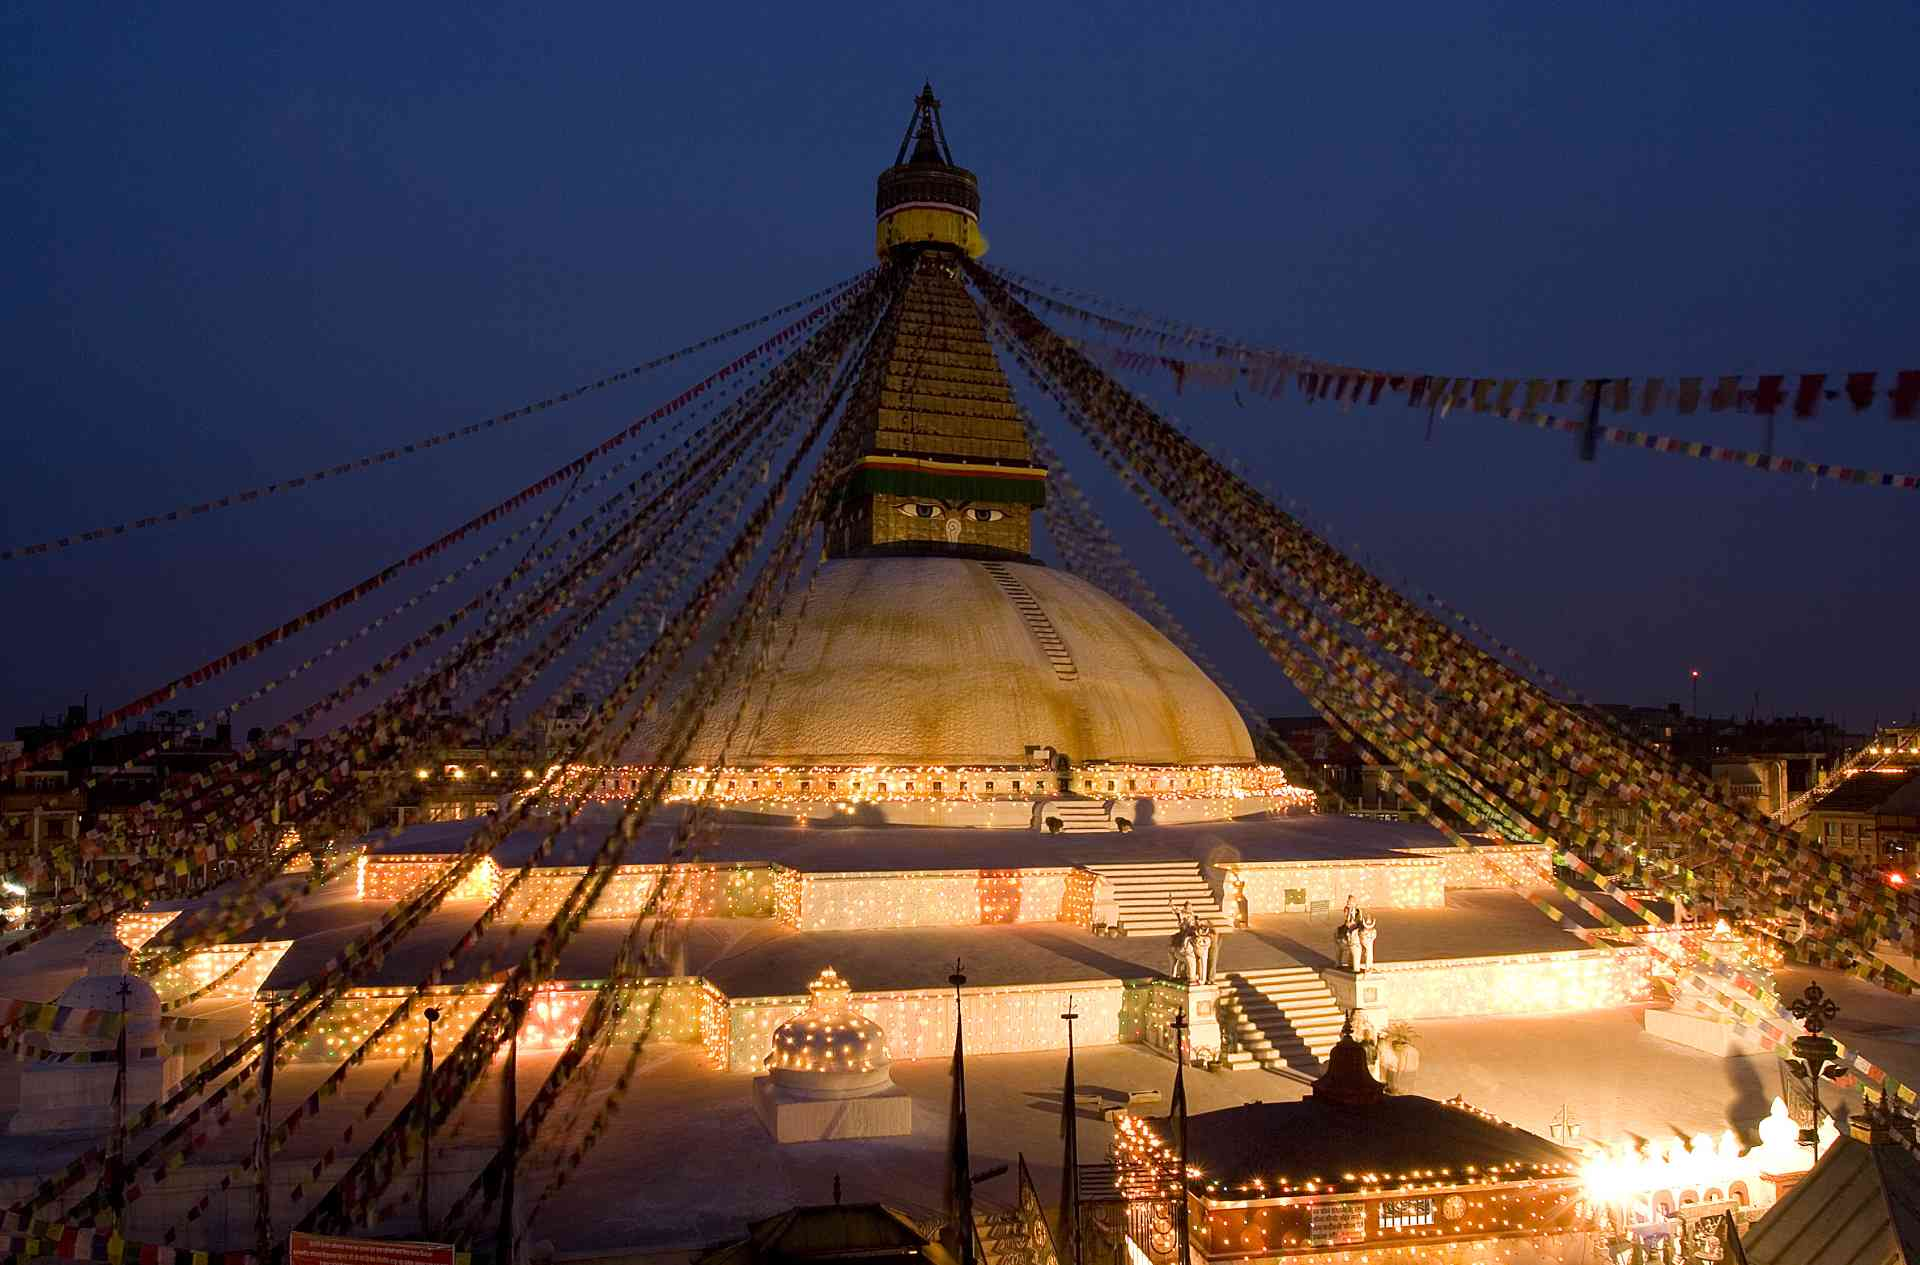 The wonder of Kathmandu